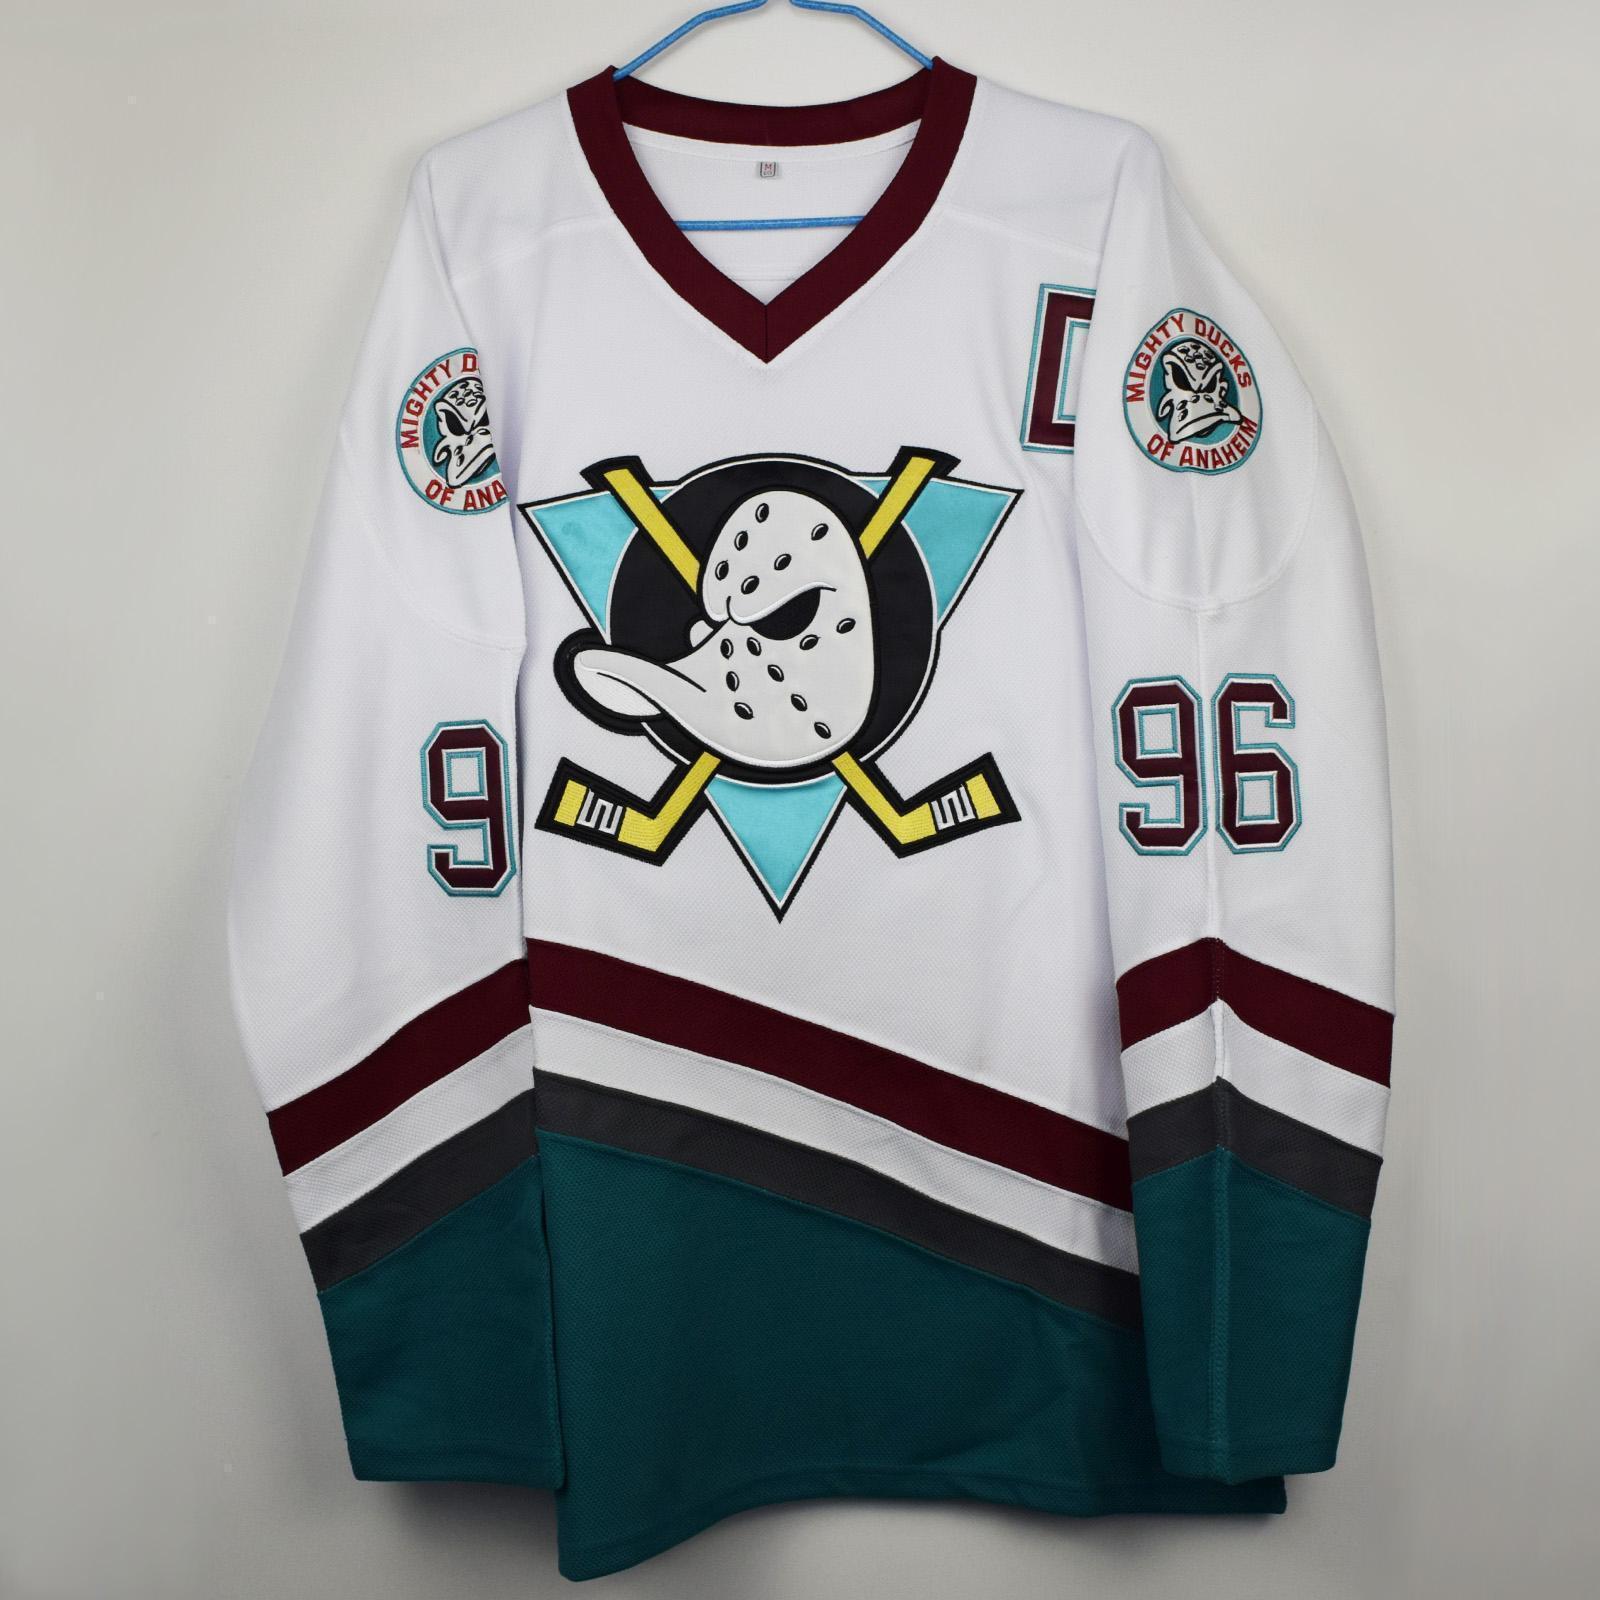 Hockey Jersey Film Version Hockey Jersey No. 96 99 White Duck White